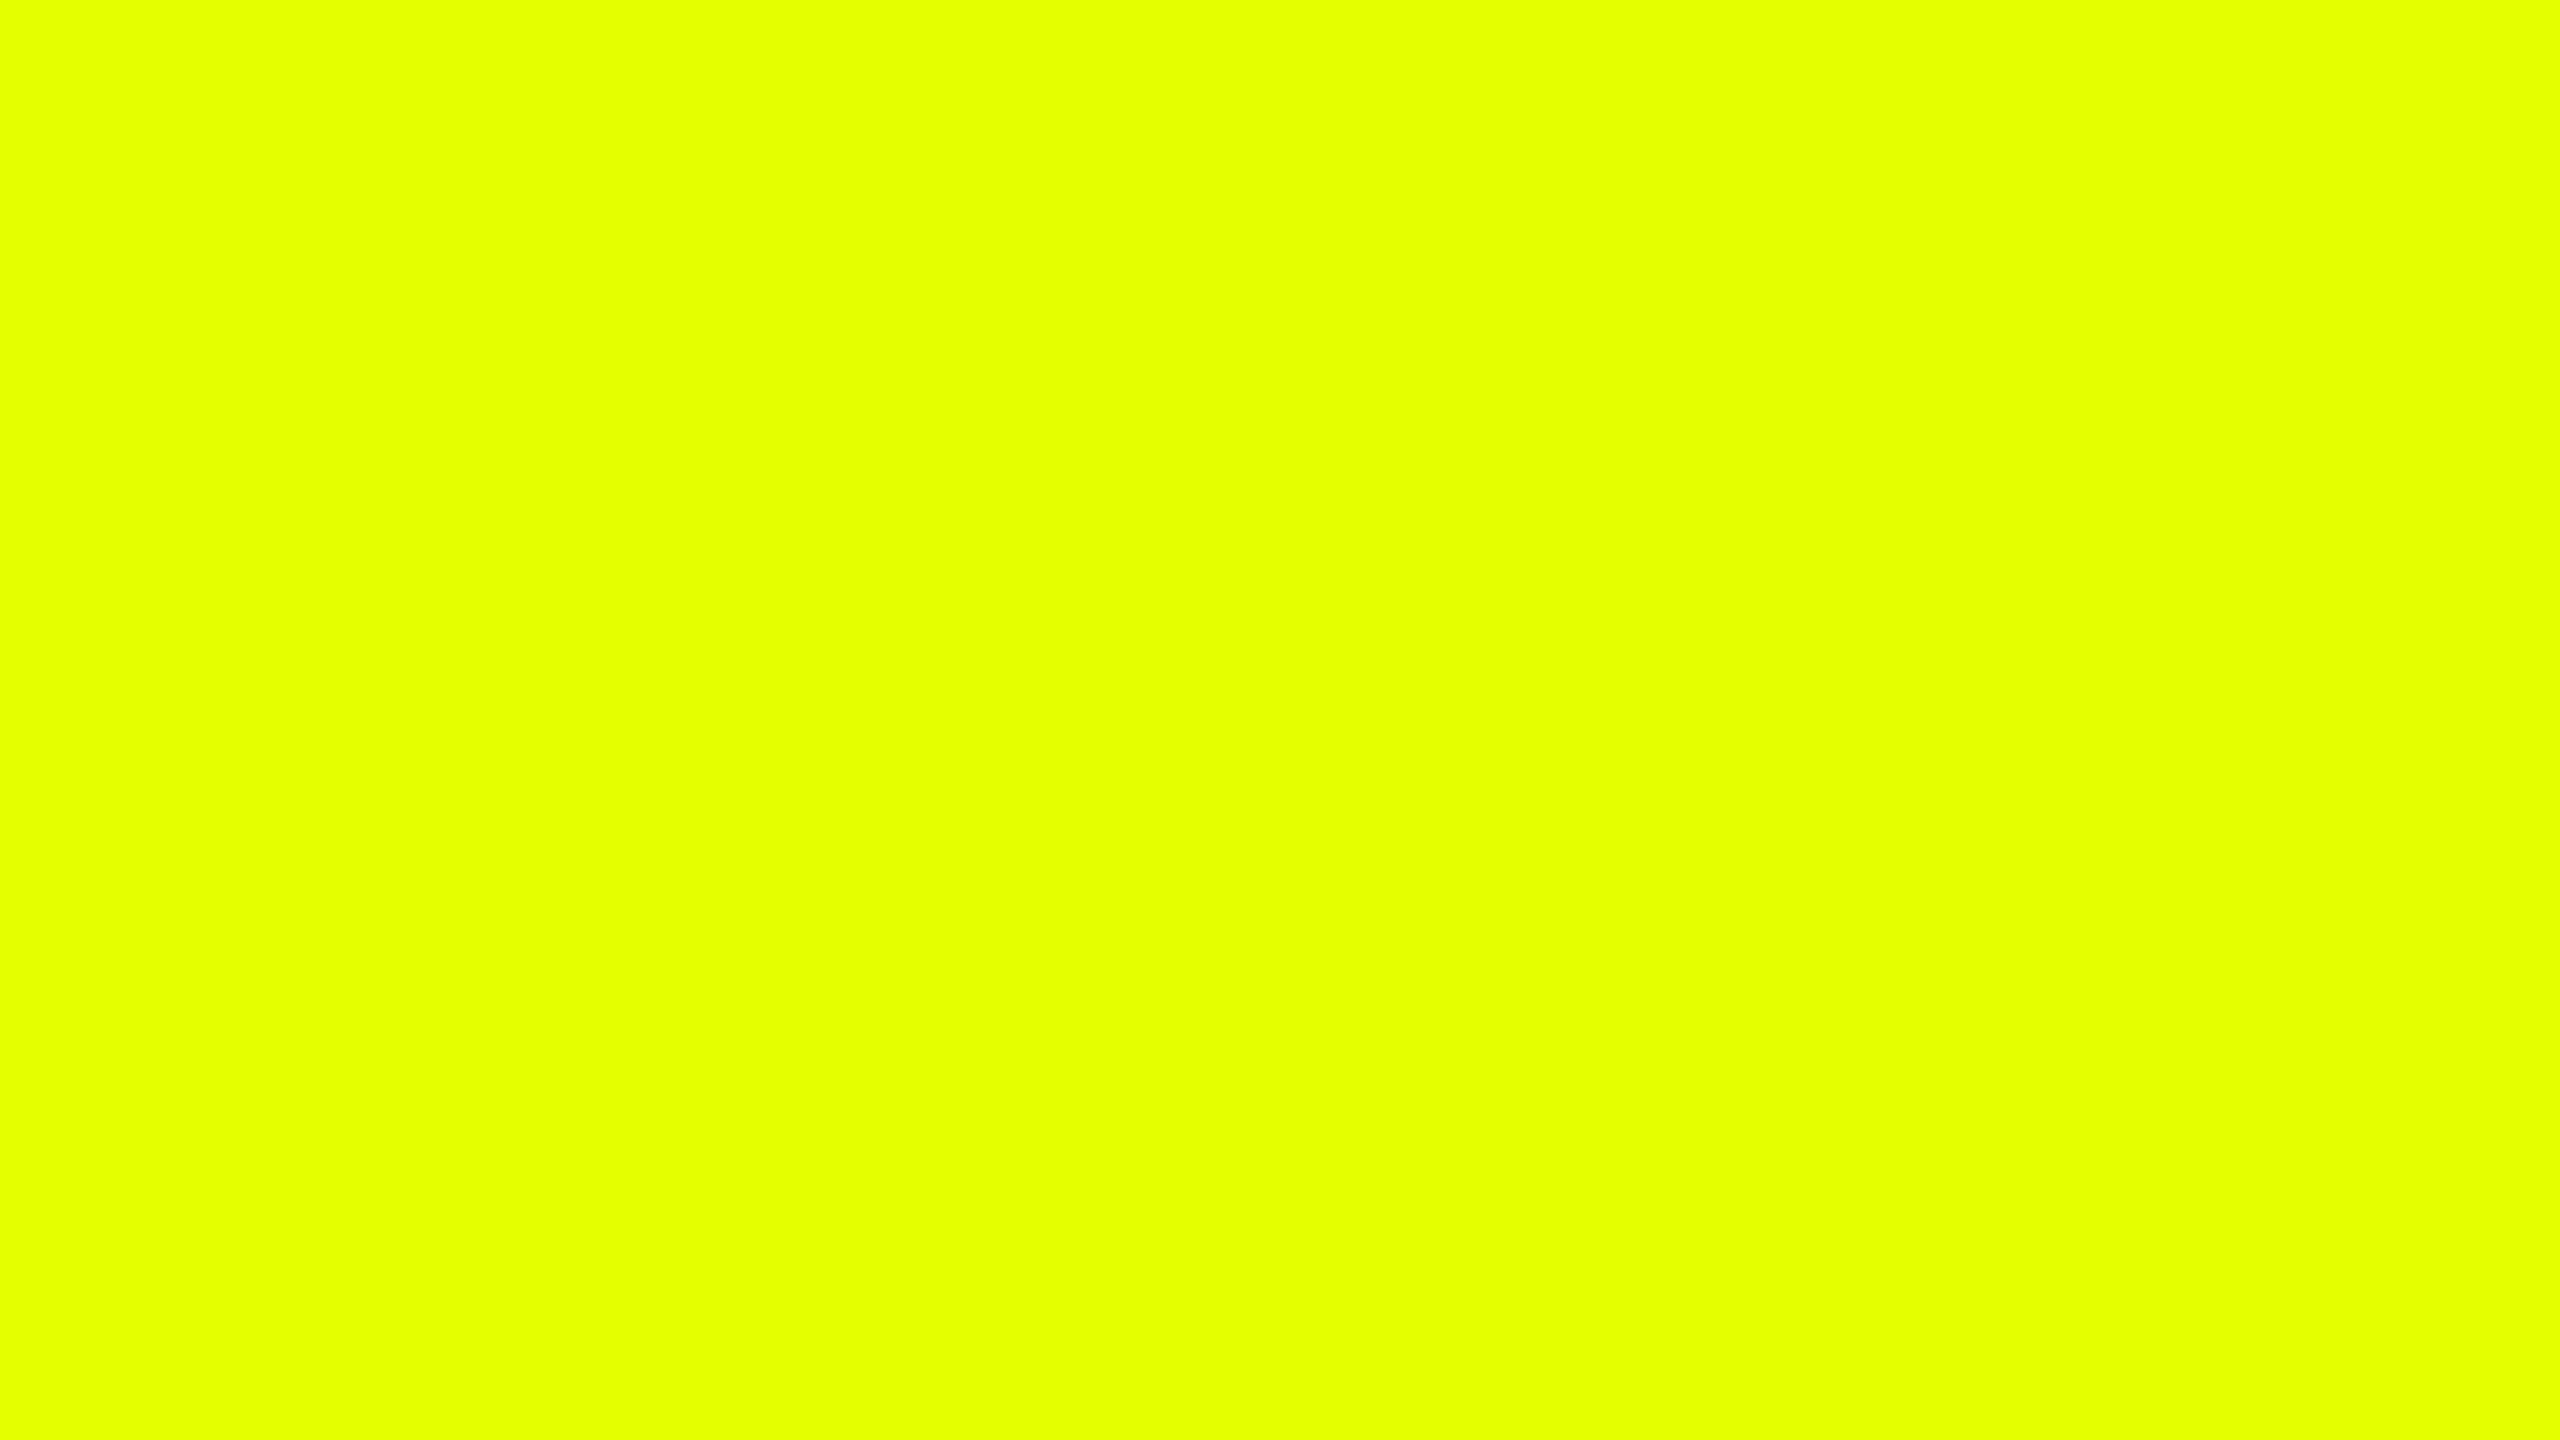 2560x1440 Lemon Lime Solid Color Background